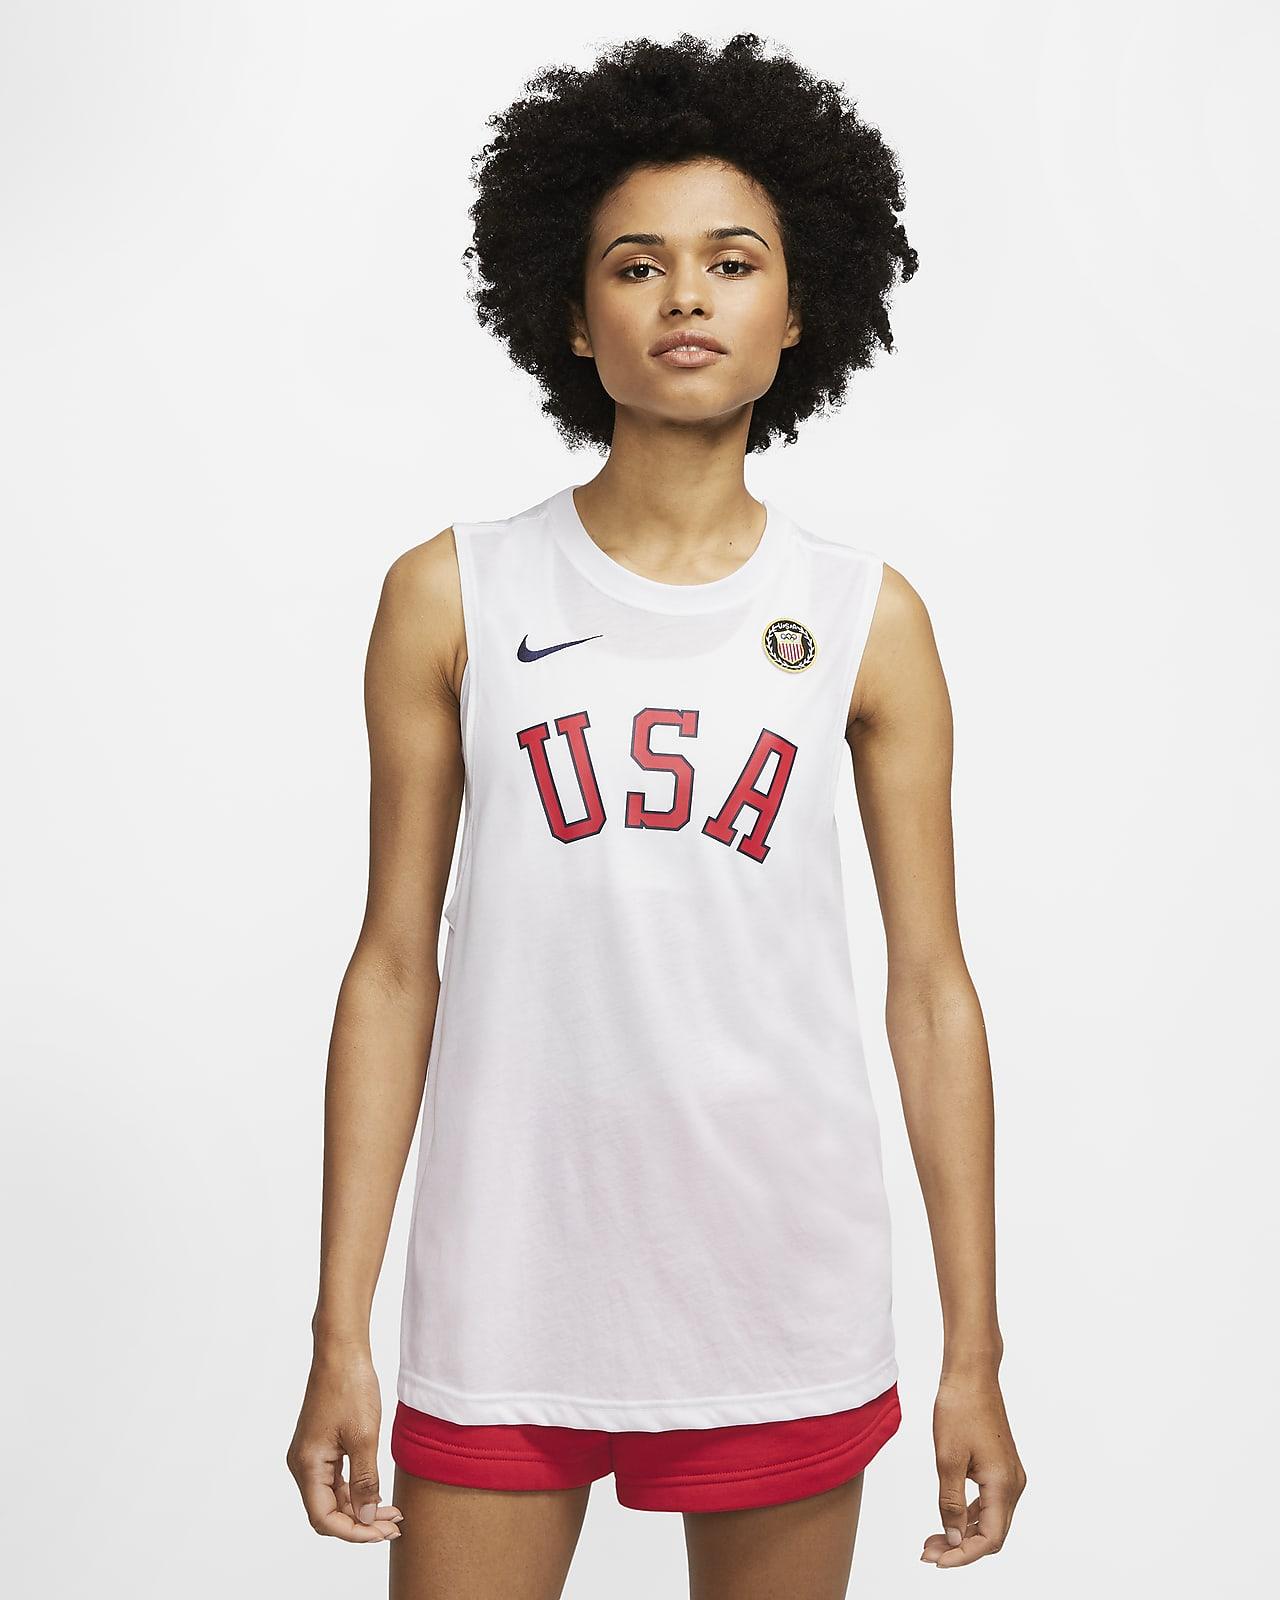 Camiseta de tirantes de entrenamiento para mujer Nike Dri-FIT Team USA